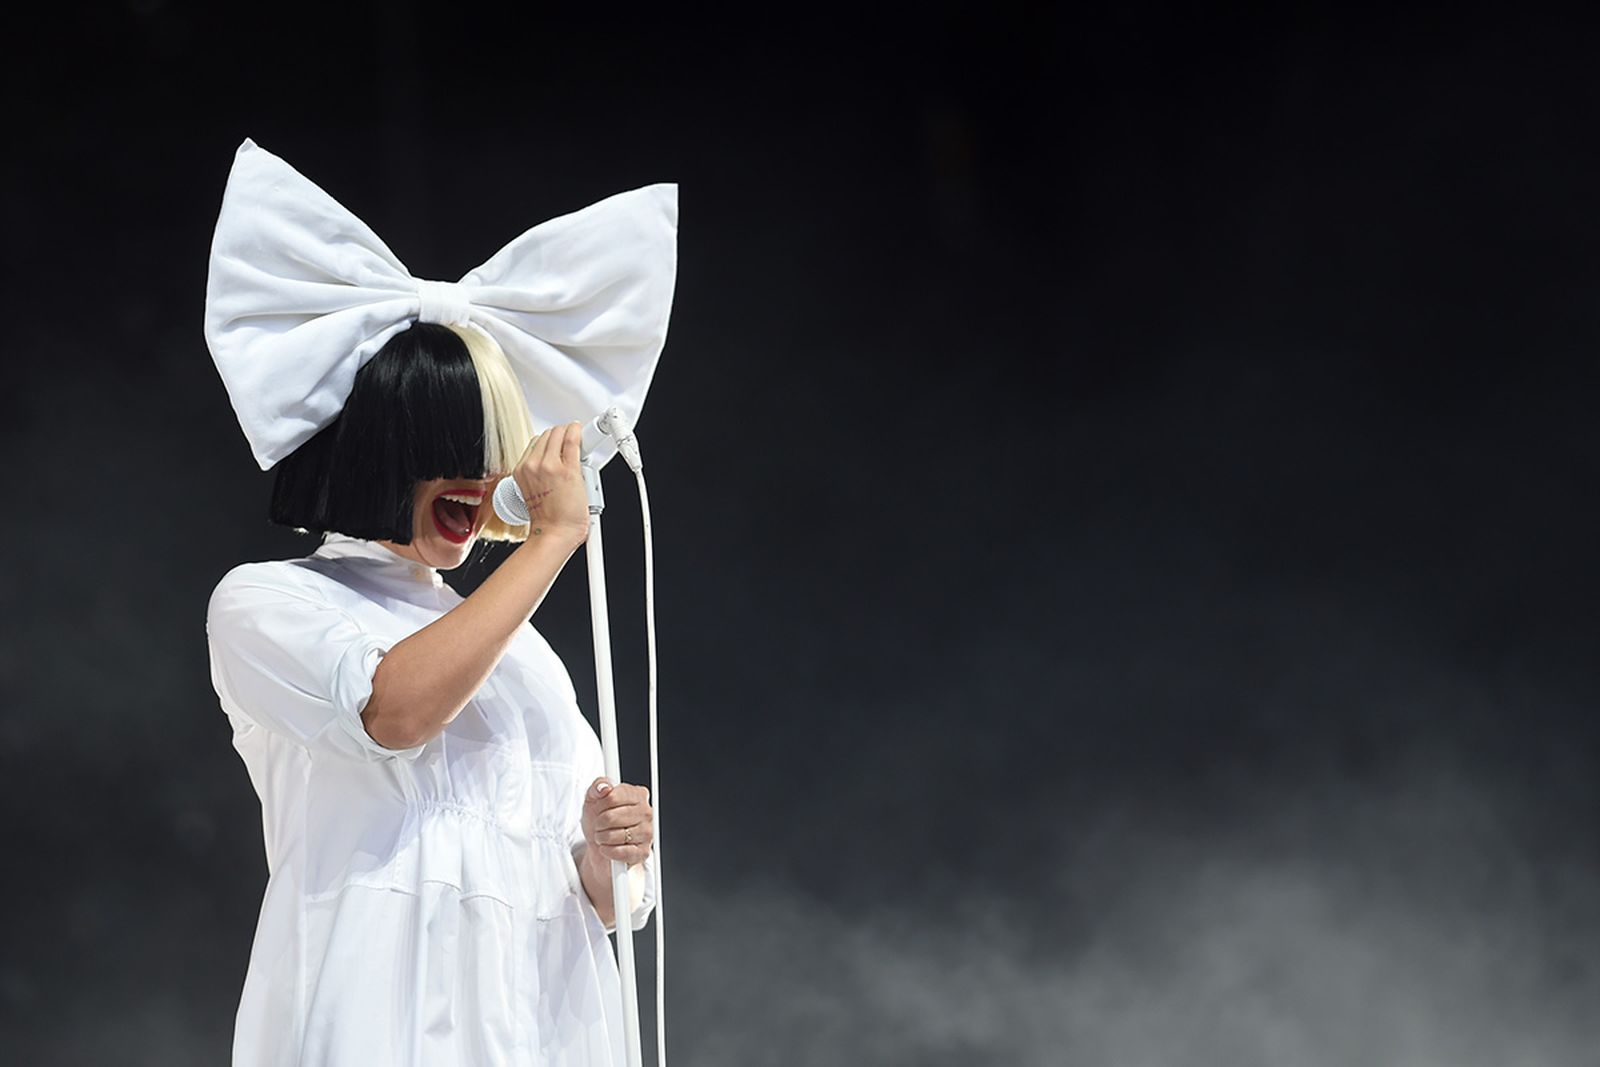 Sia performs at V Festival at Hylands Park